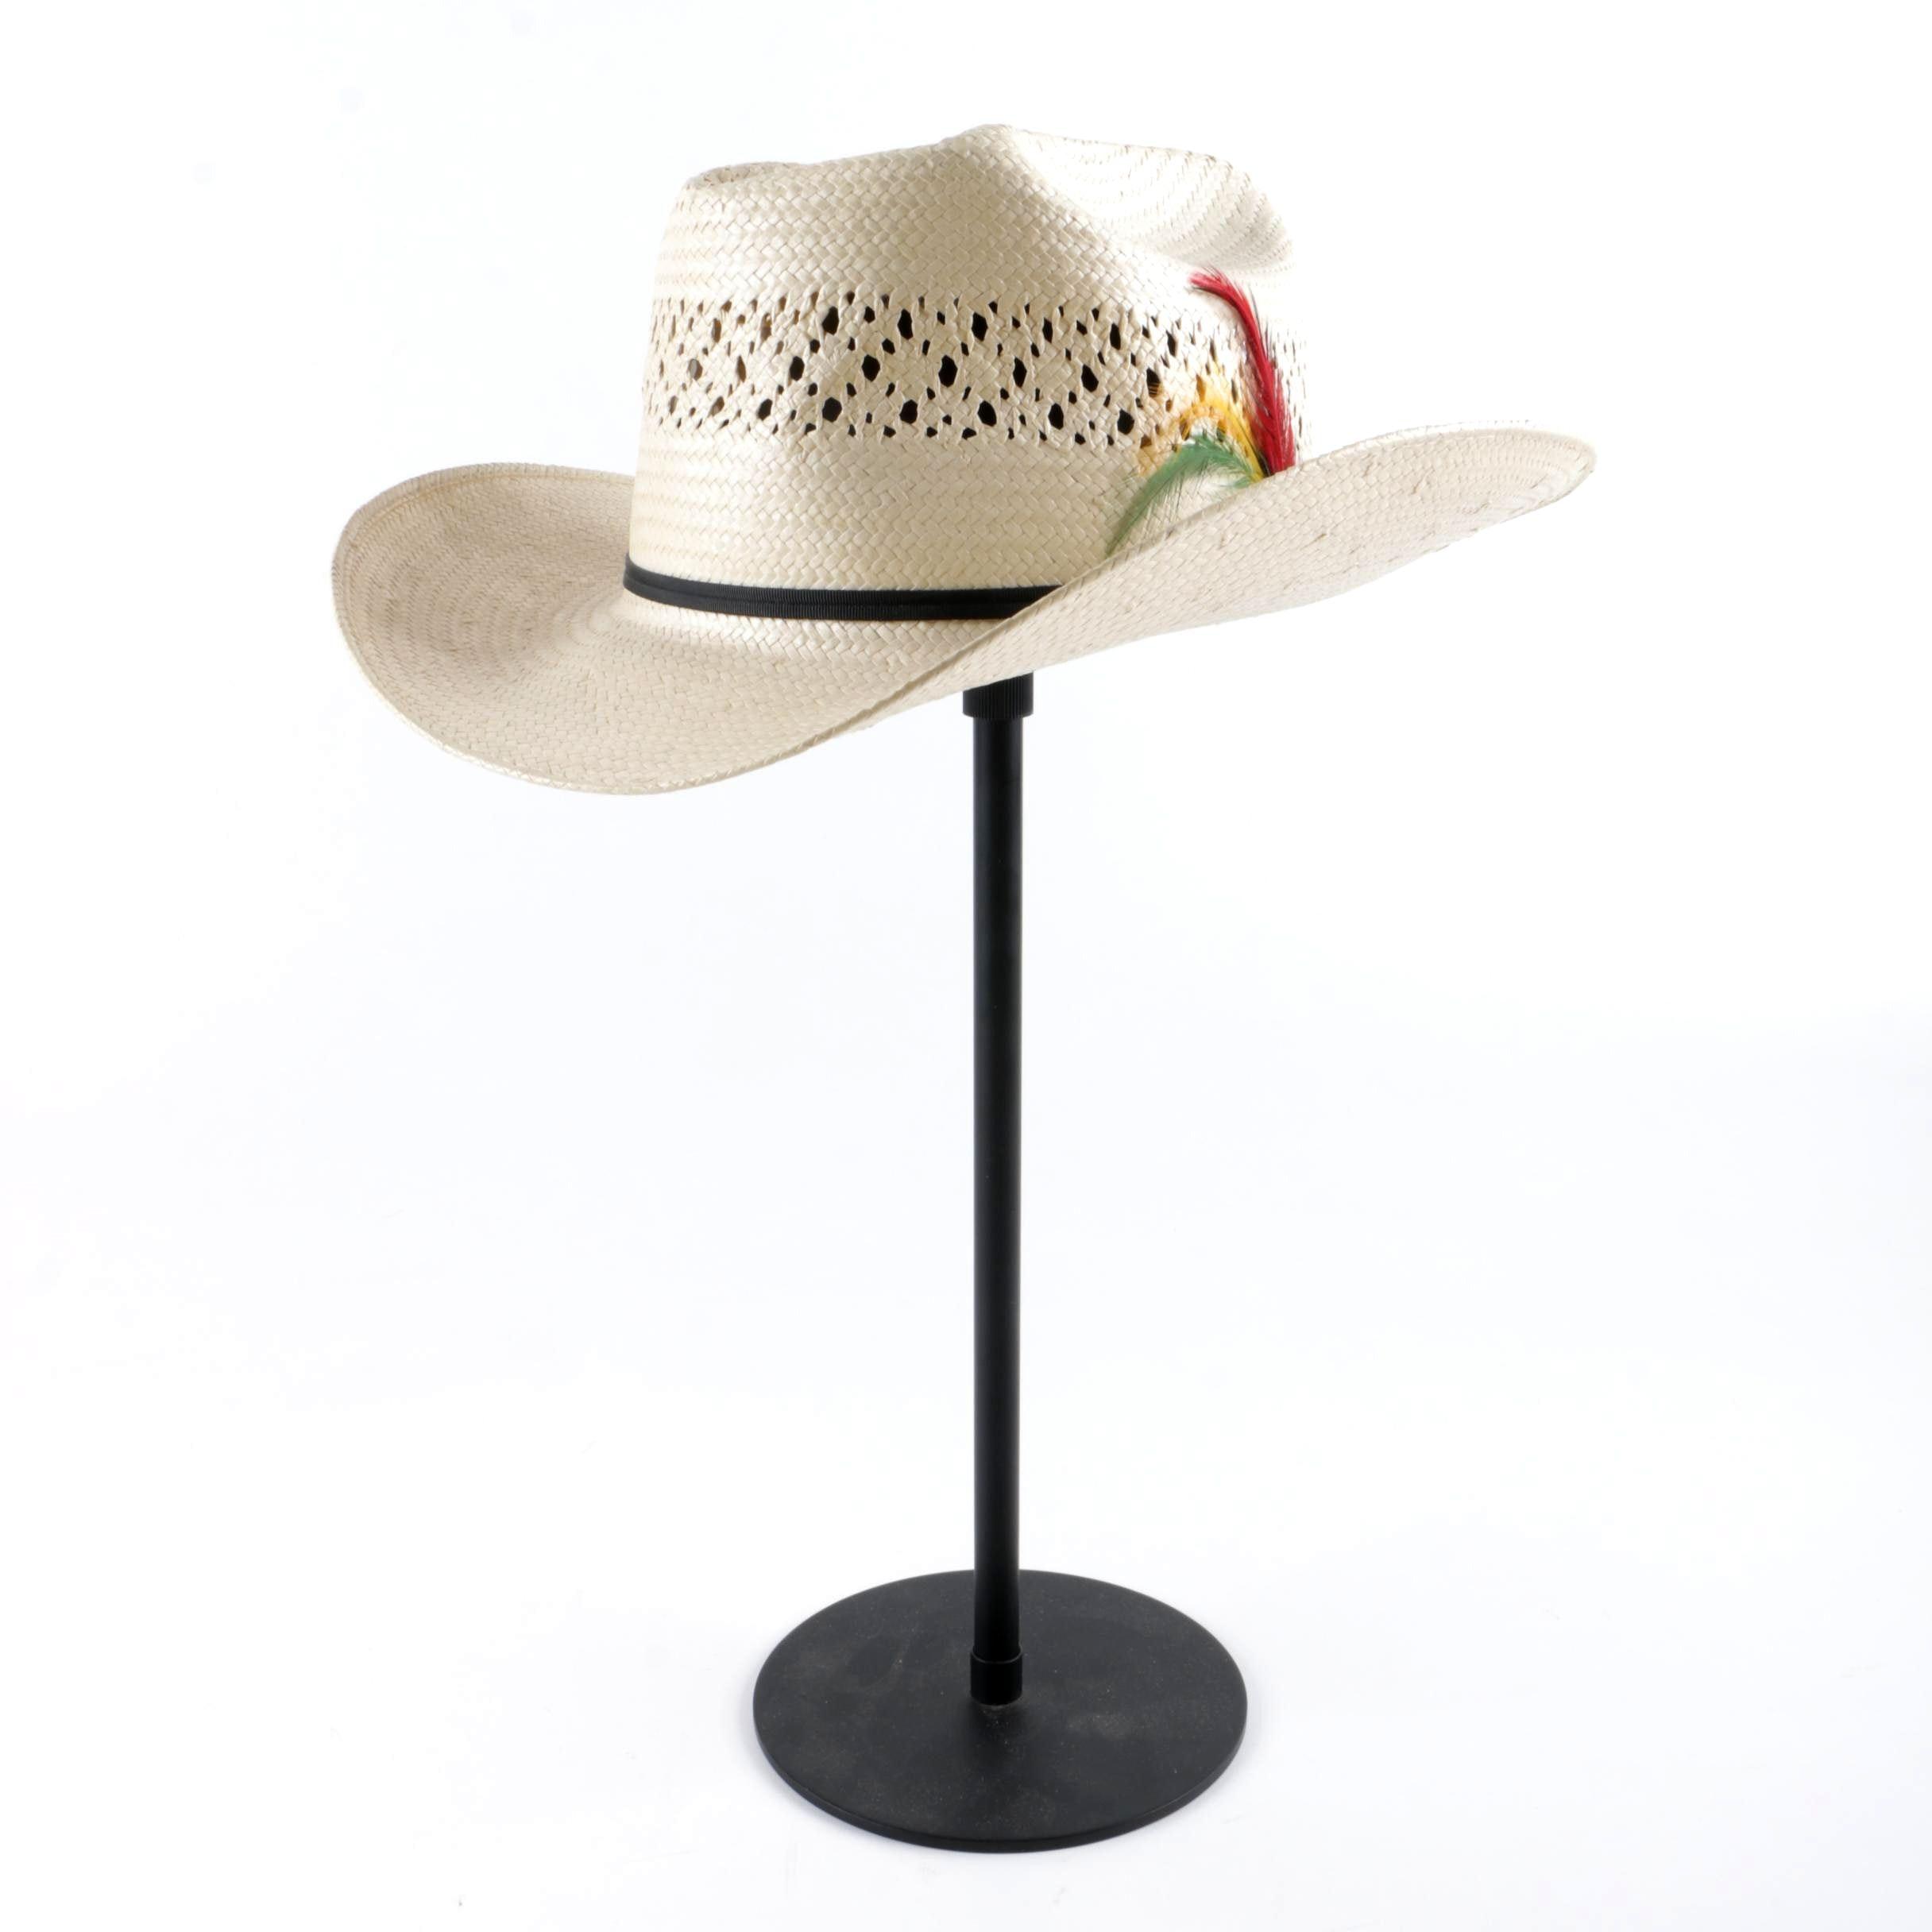 Men's John B. Stetson Company Ranger Natural Woven Straw Cowboy Hat